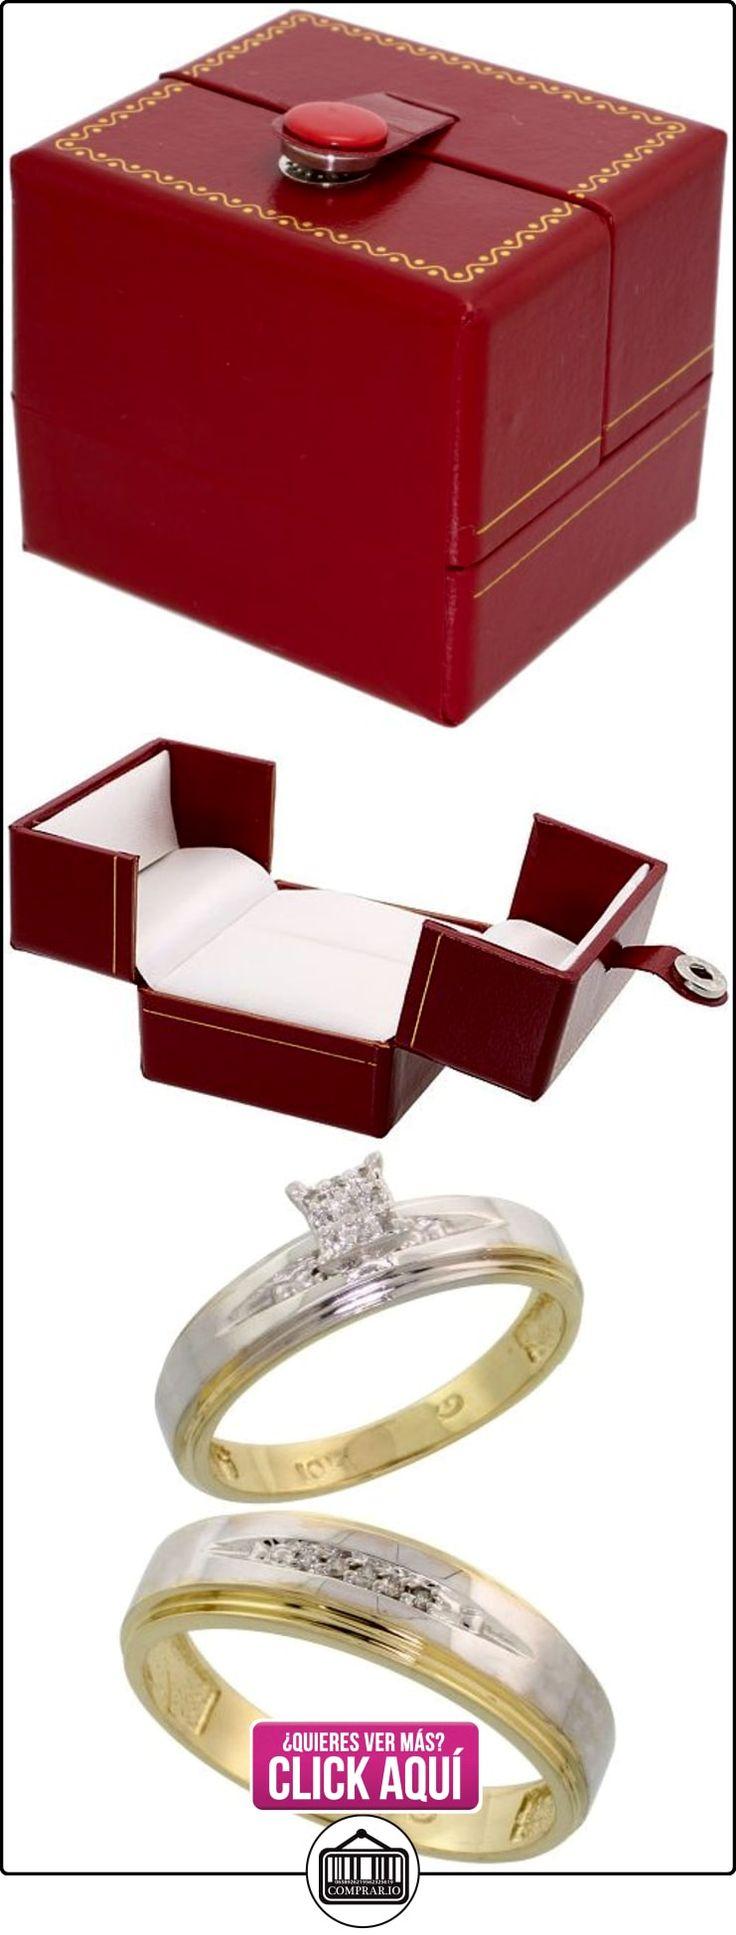 Revoni - Anillo de compromiso de oro amarillo  ✿ Joyas para hombres especiales - lujo ✿ ▬► Ver oferta: http://comprar.io/goto/B005M3GAQS